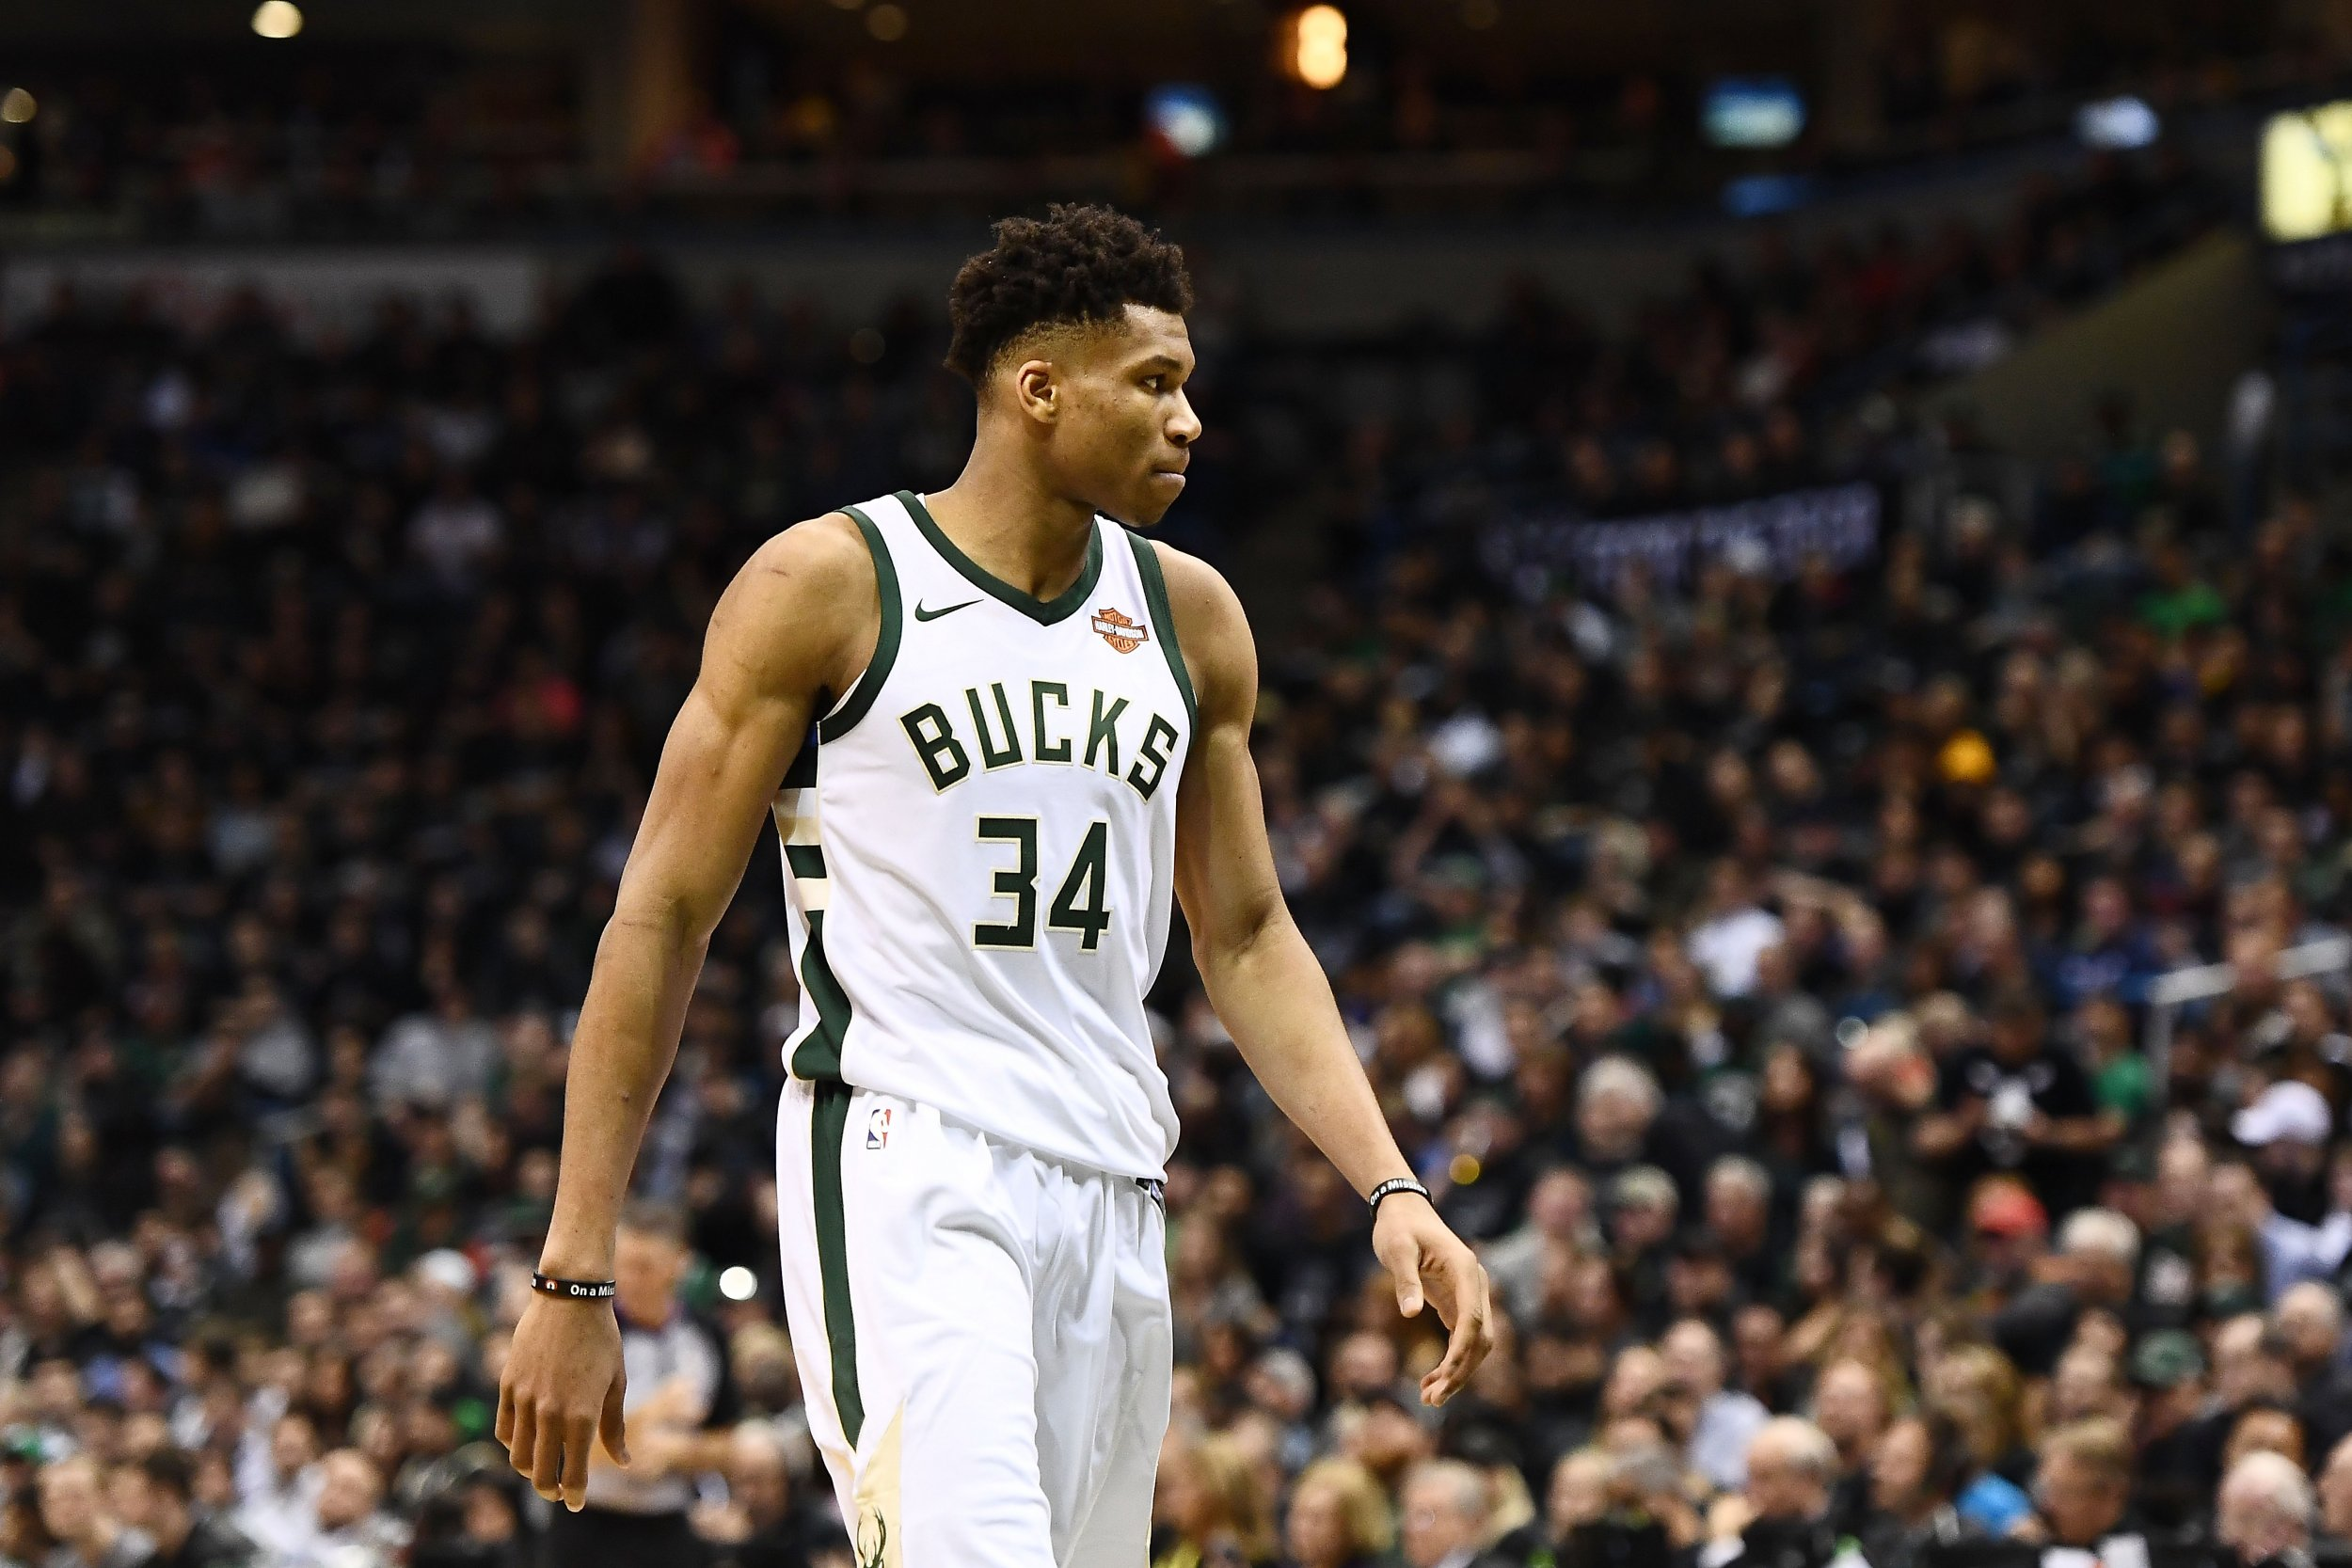 Giannis Antetokounmpo Leads Milwaukee To Win Over Celtics